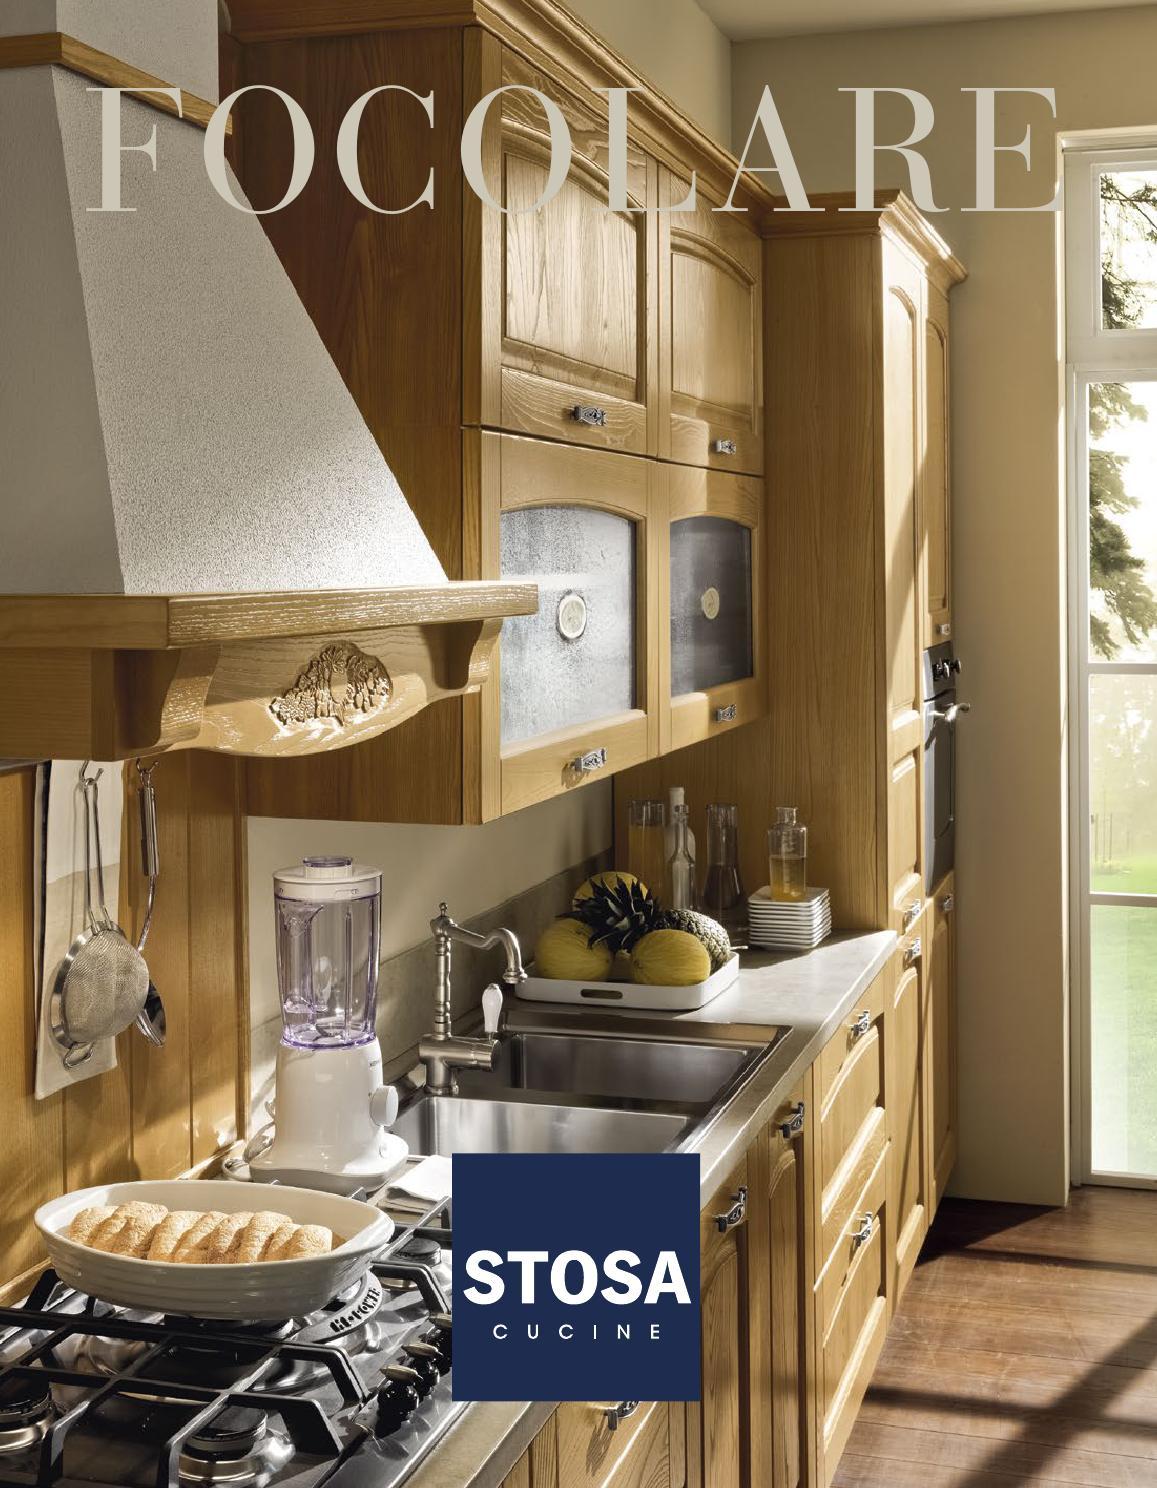 Cucina Stosa Focolare | Centro Cucine Stosa Fratelli Cutini Mobili ...